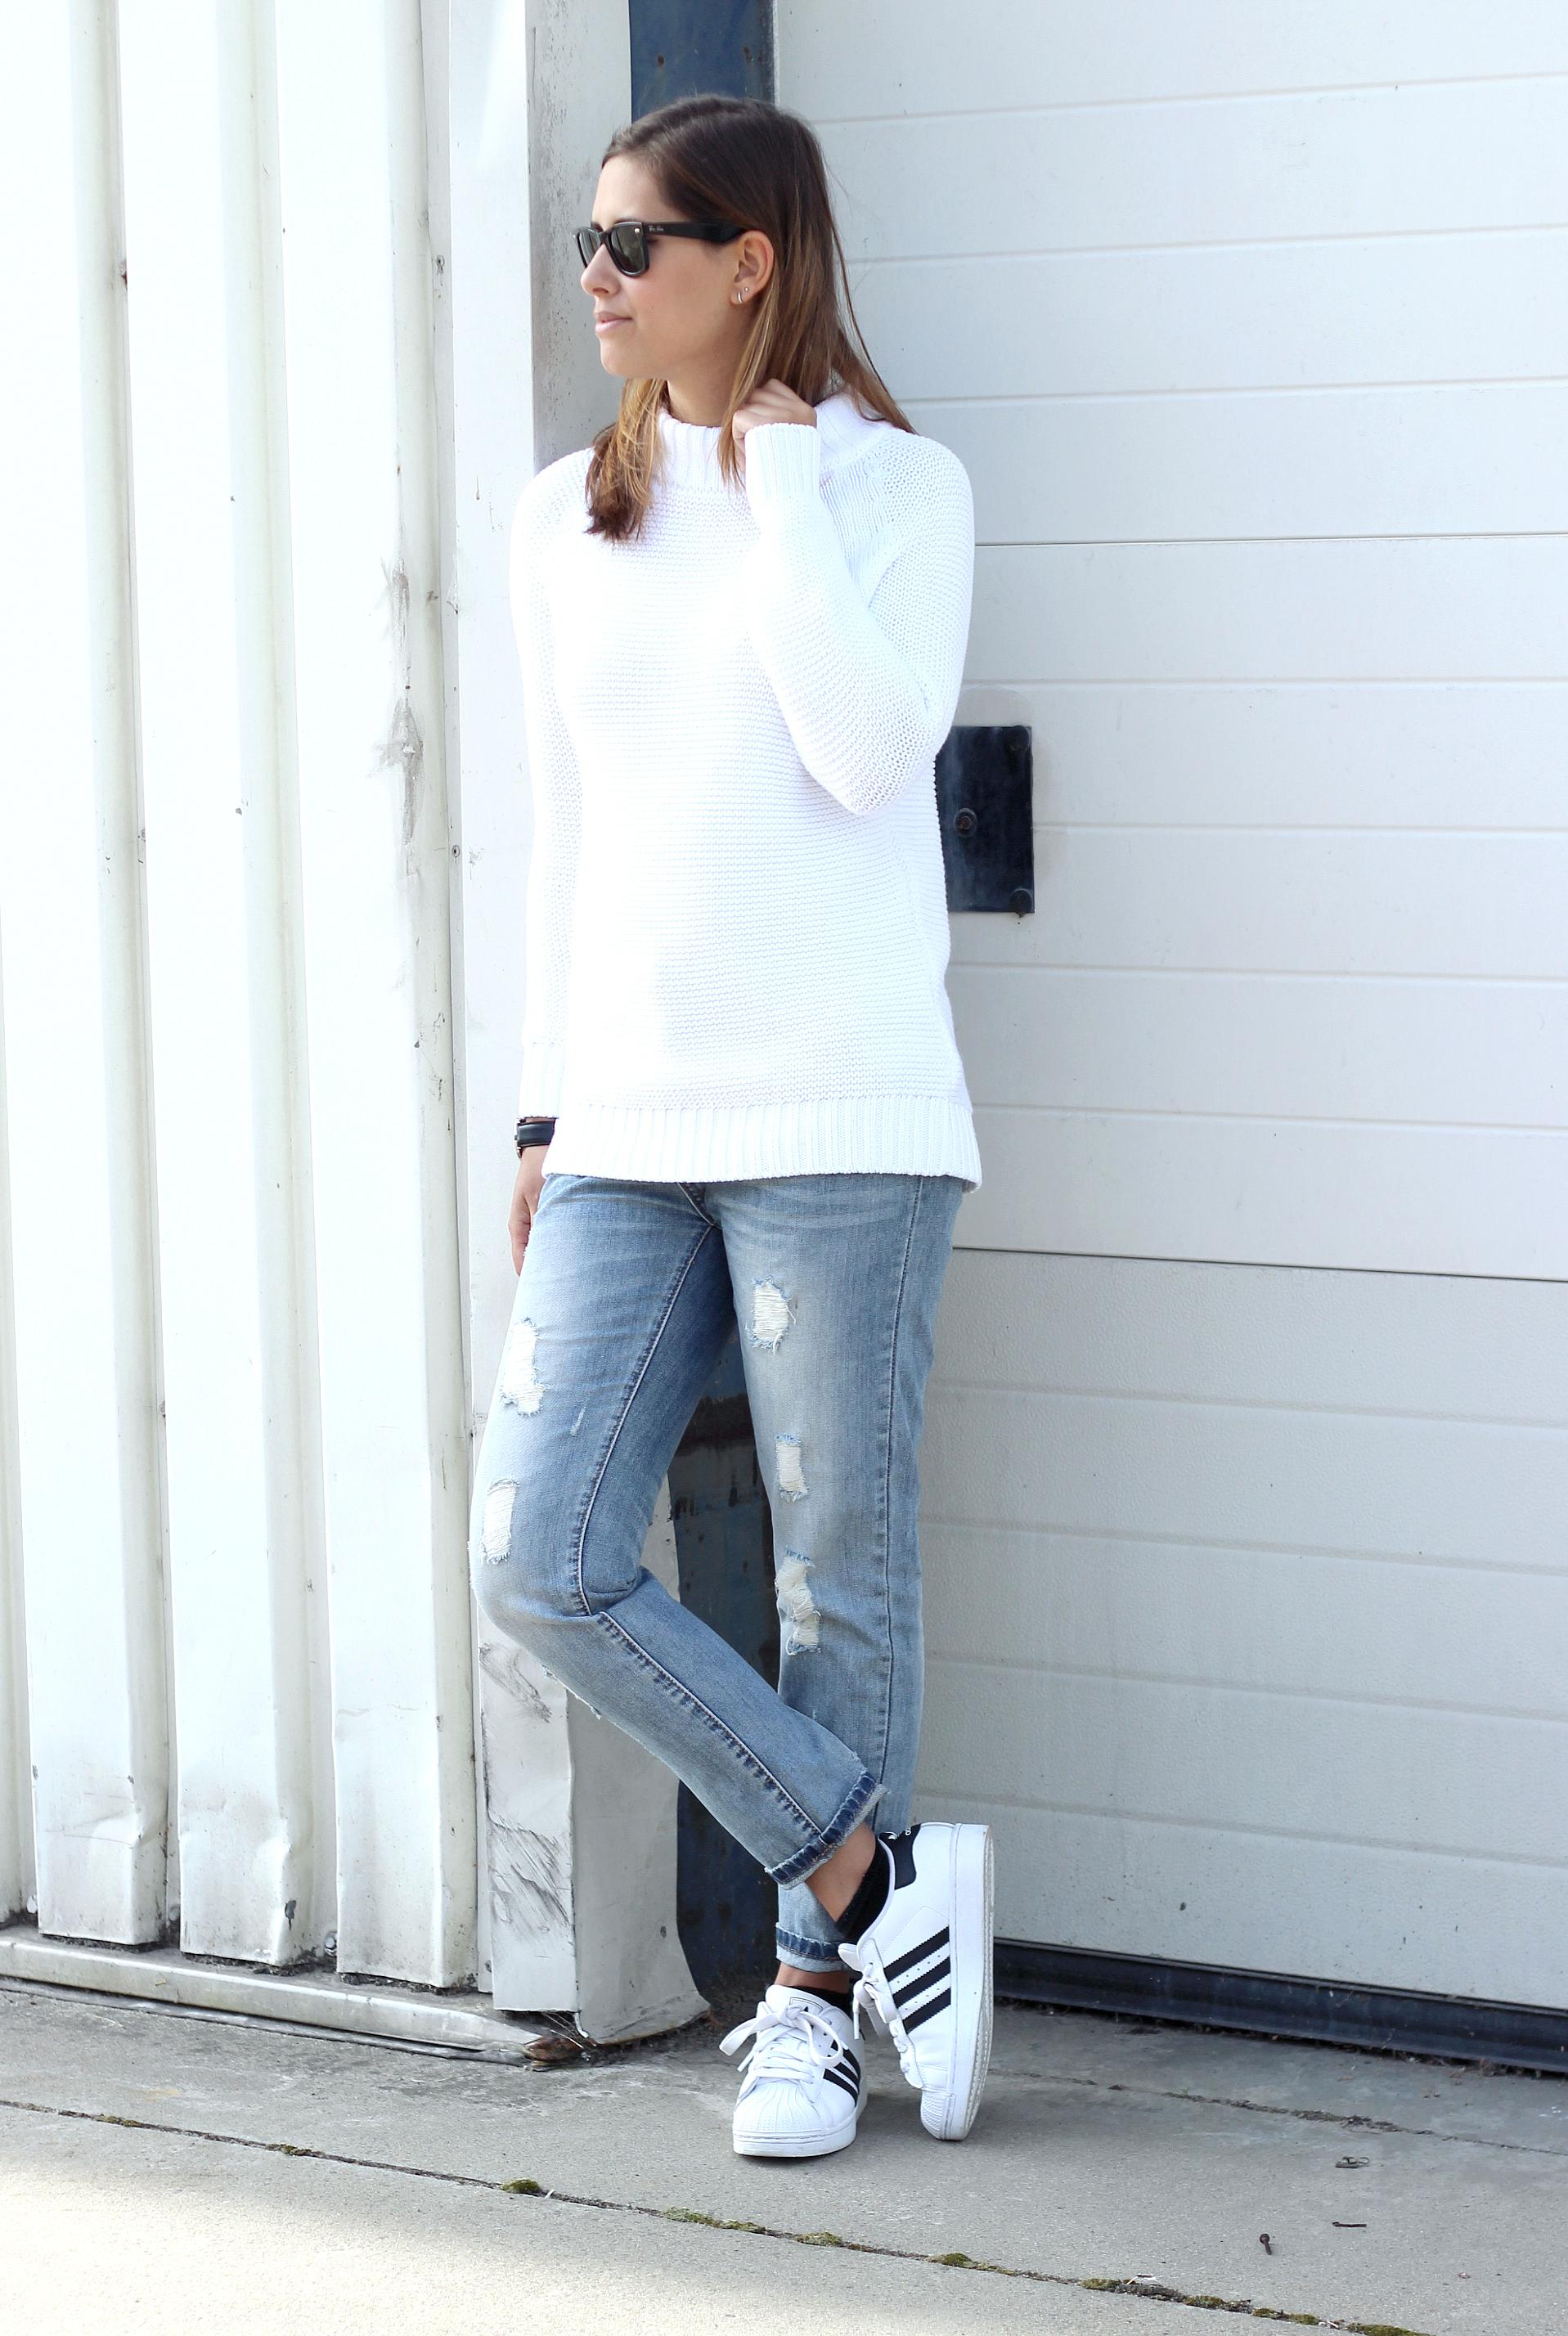 Adidas Superstar White Outfits frankluckham.co.uk